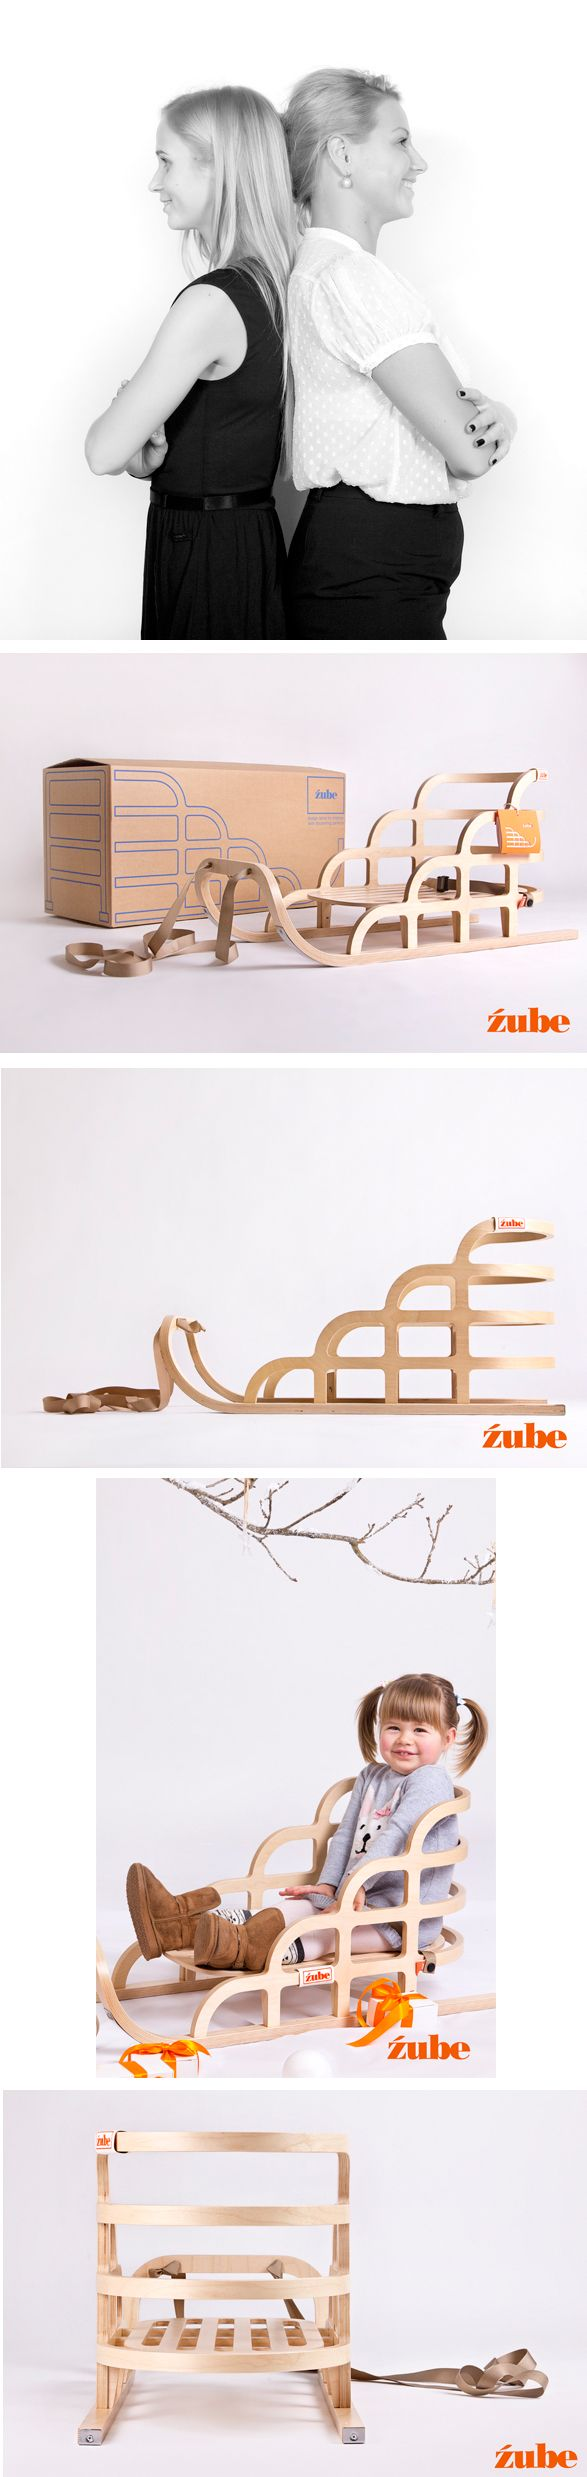 ZUBE. Latvian design sledges. PURCHASE ON TRUE LATVIA shophttp://truelatvia.lv/en/true-ziimoli-452721/zube